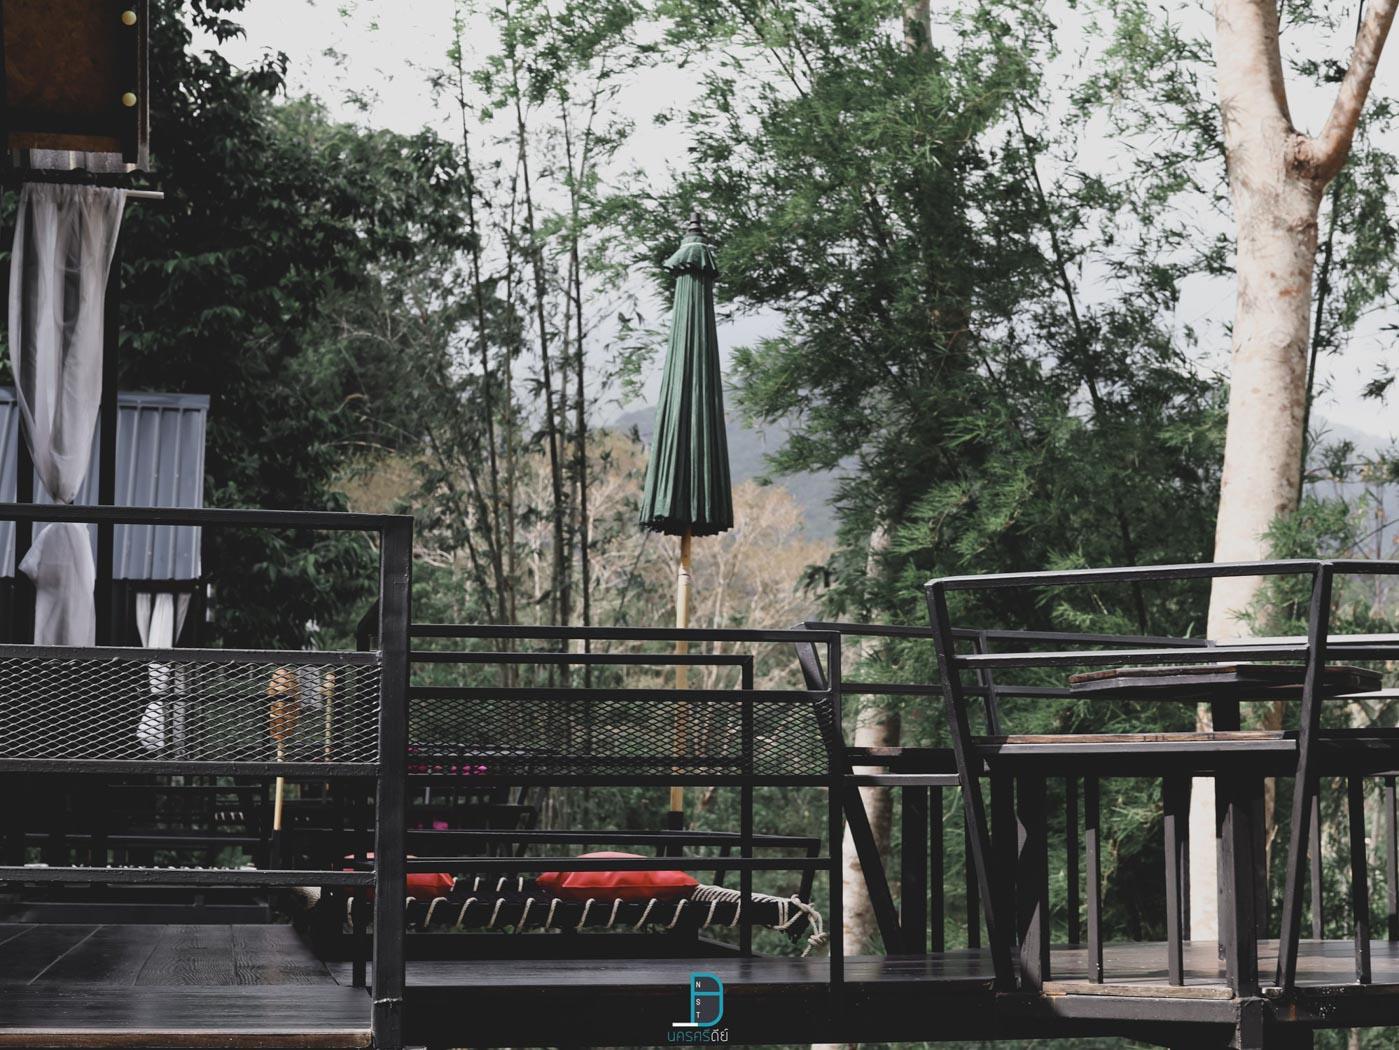 1.-Chanya-Resort-ช้างกลาง คลิกที่นี่ ที่พัก,นครศรีธรรมราช,เที่ยว,เมืองคอน,วิวหลักล้าน,สวย